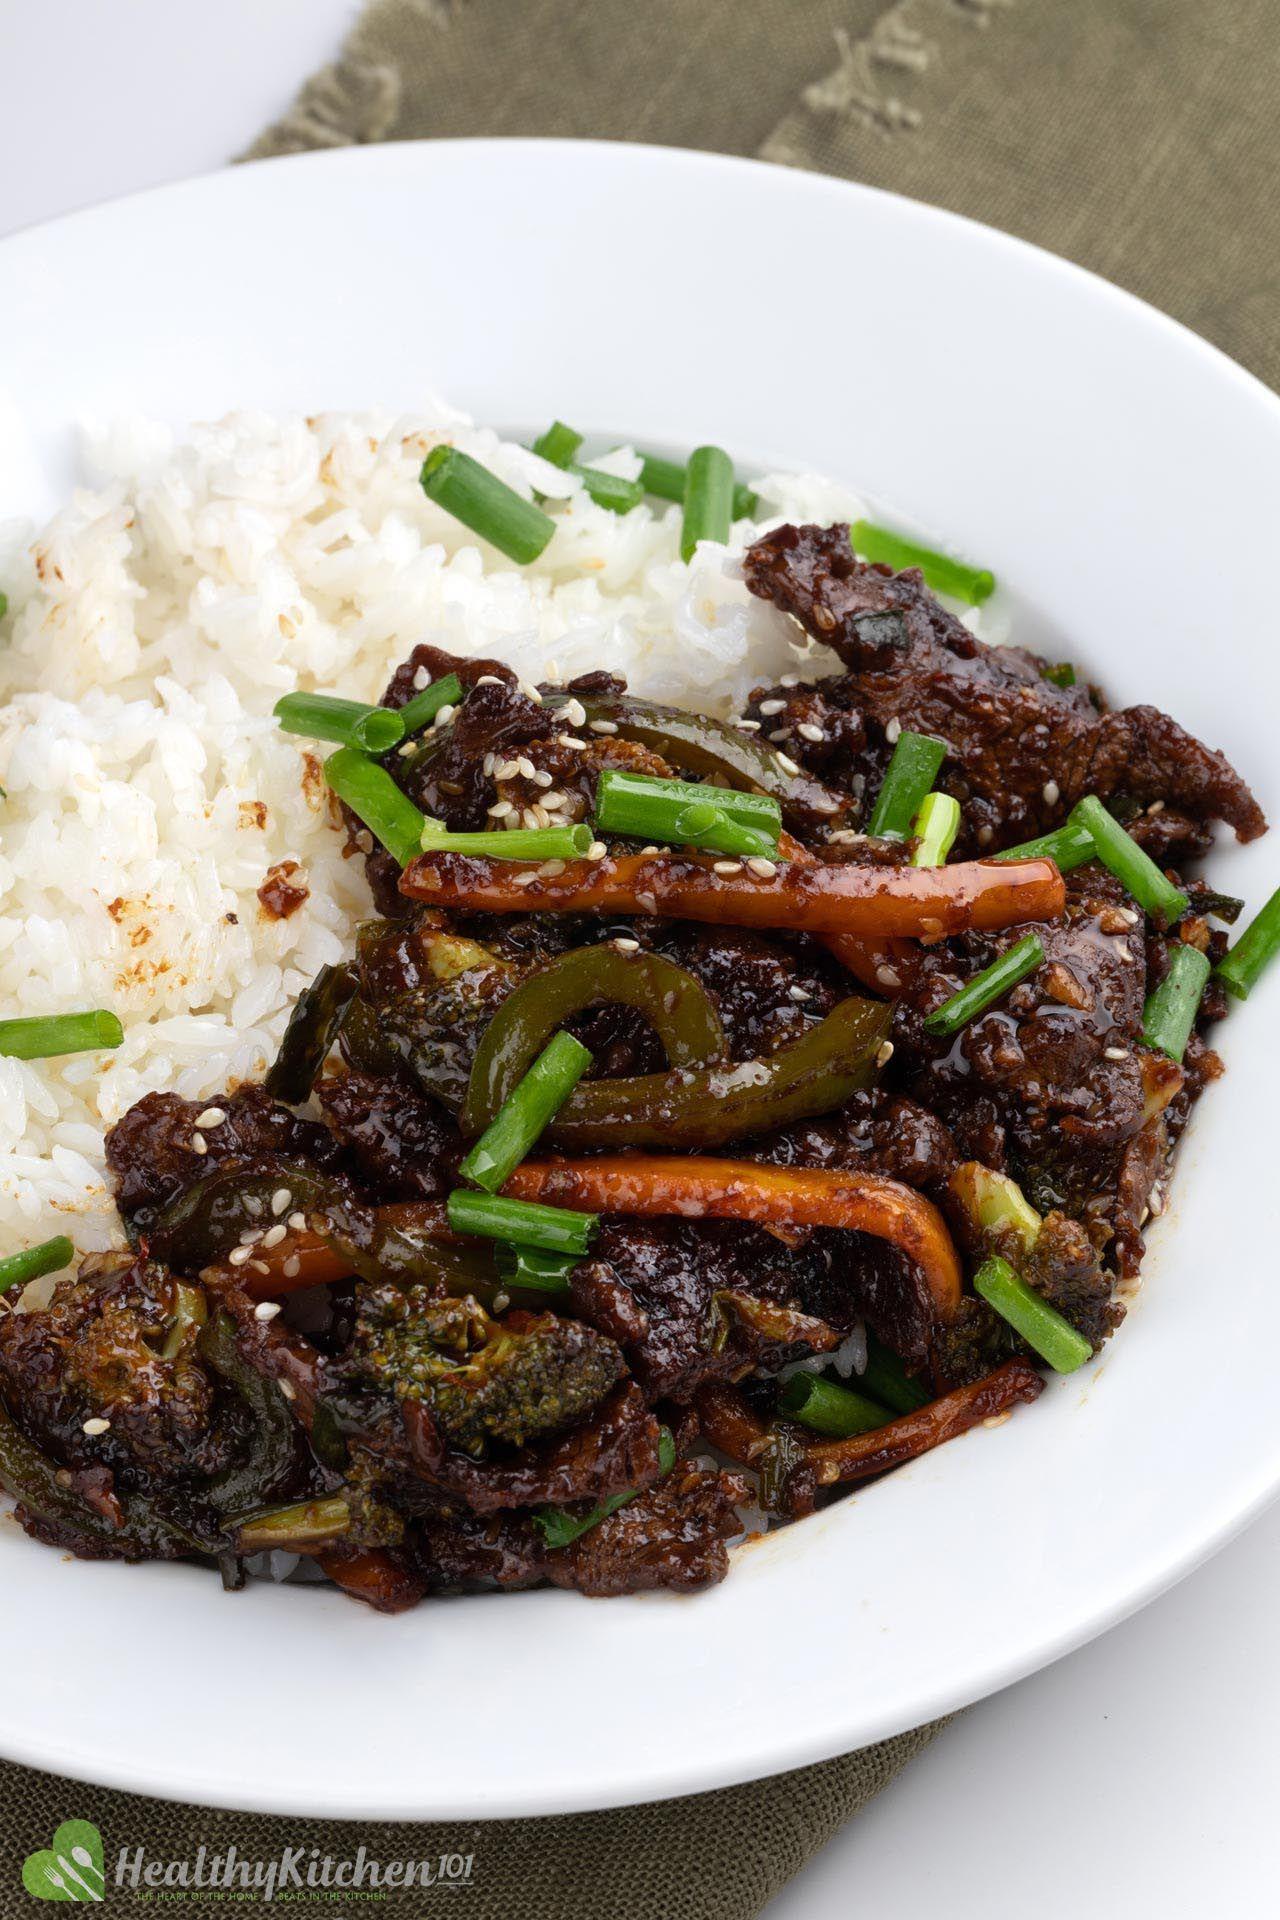 Mongolian Beef Recipe In 2021 Beef Recipes Mongolian Beef Recipes Recipes